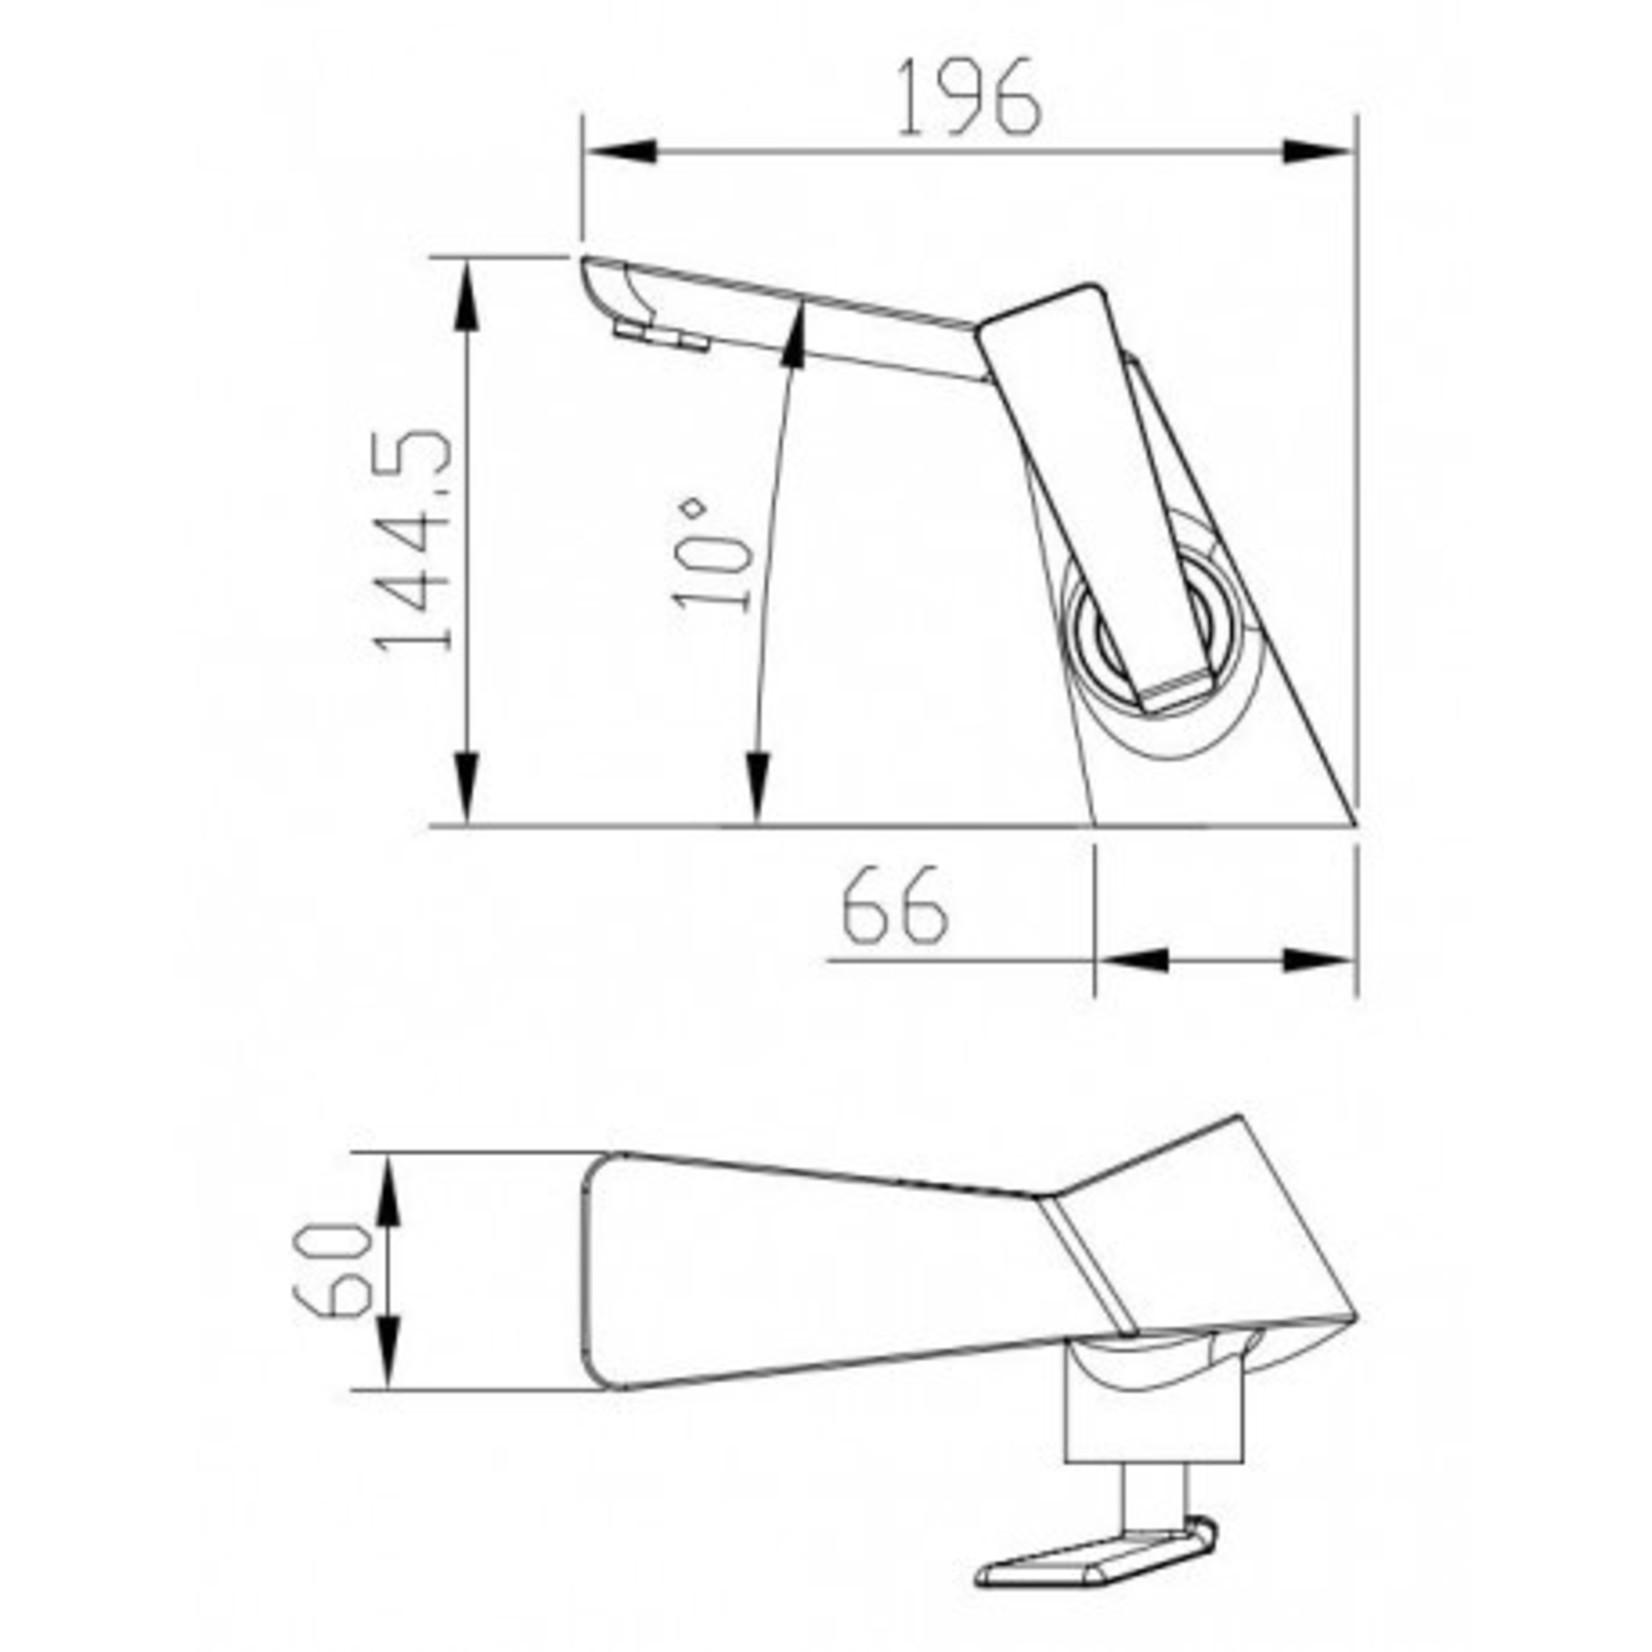 Luhö Luho Matte Black Finish Lavatory Faucet